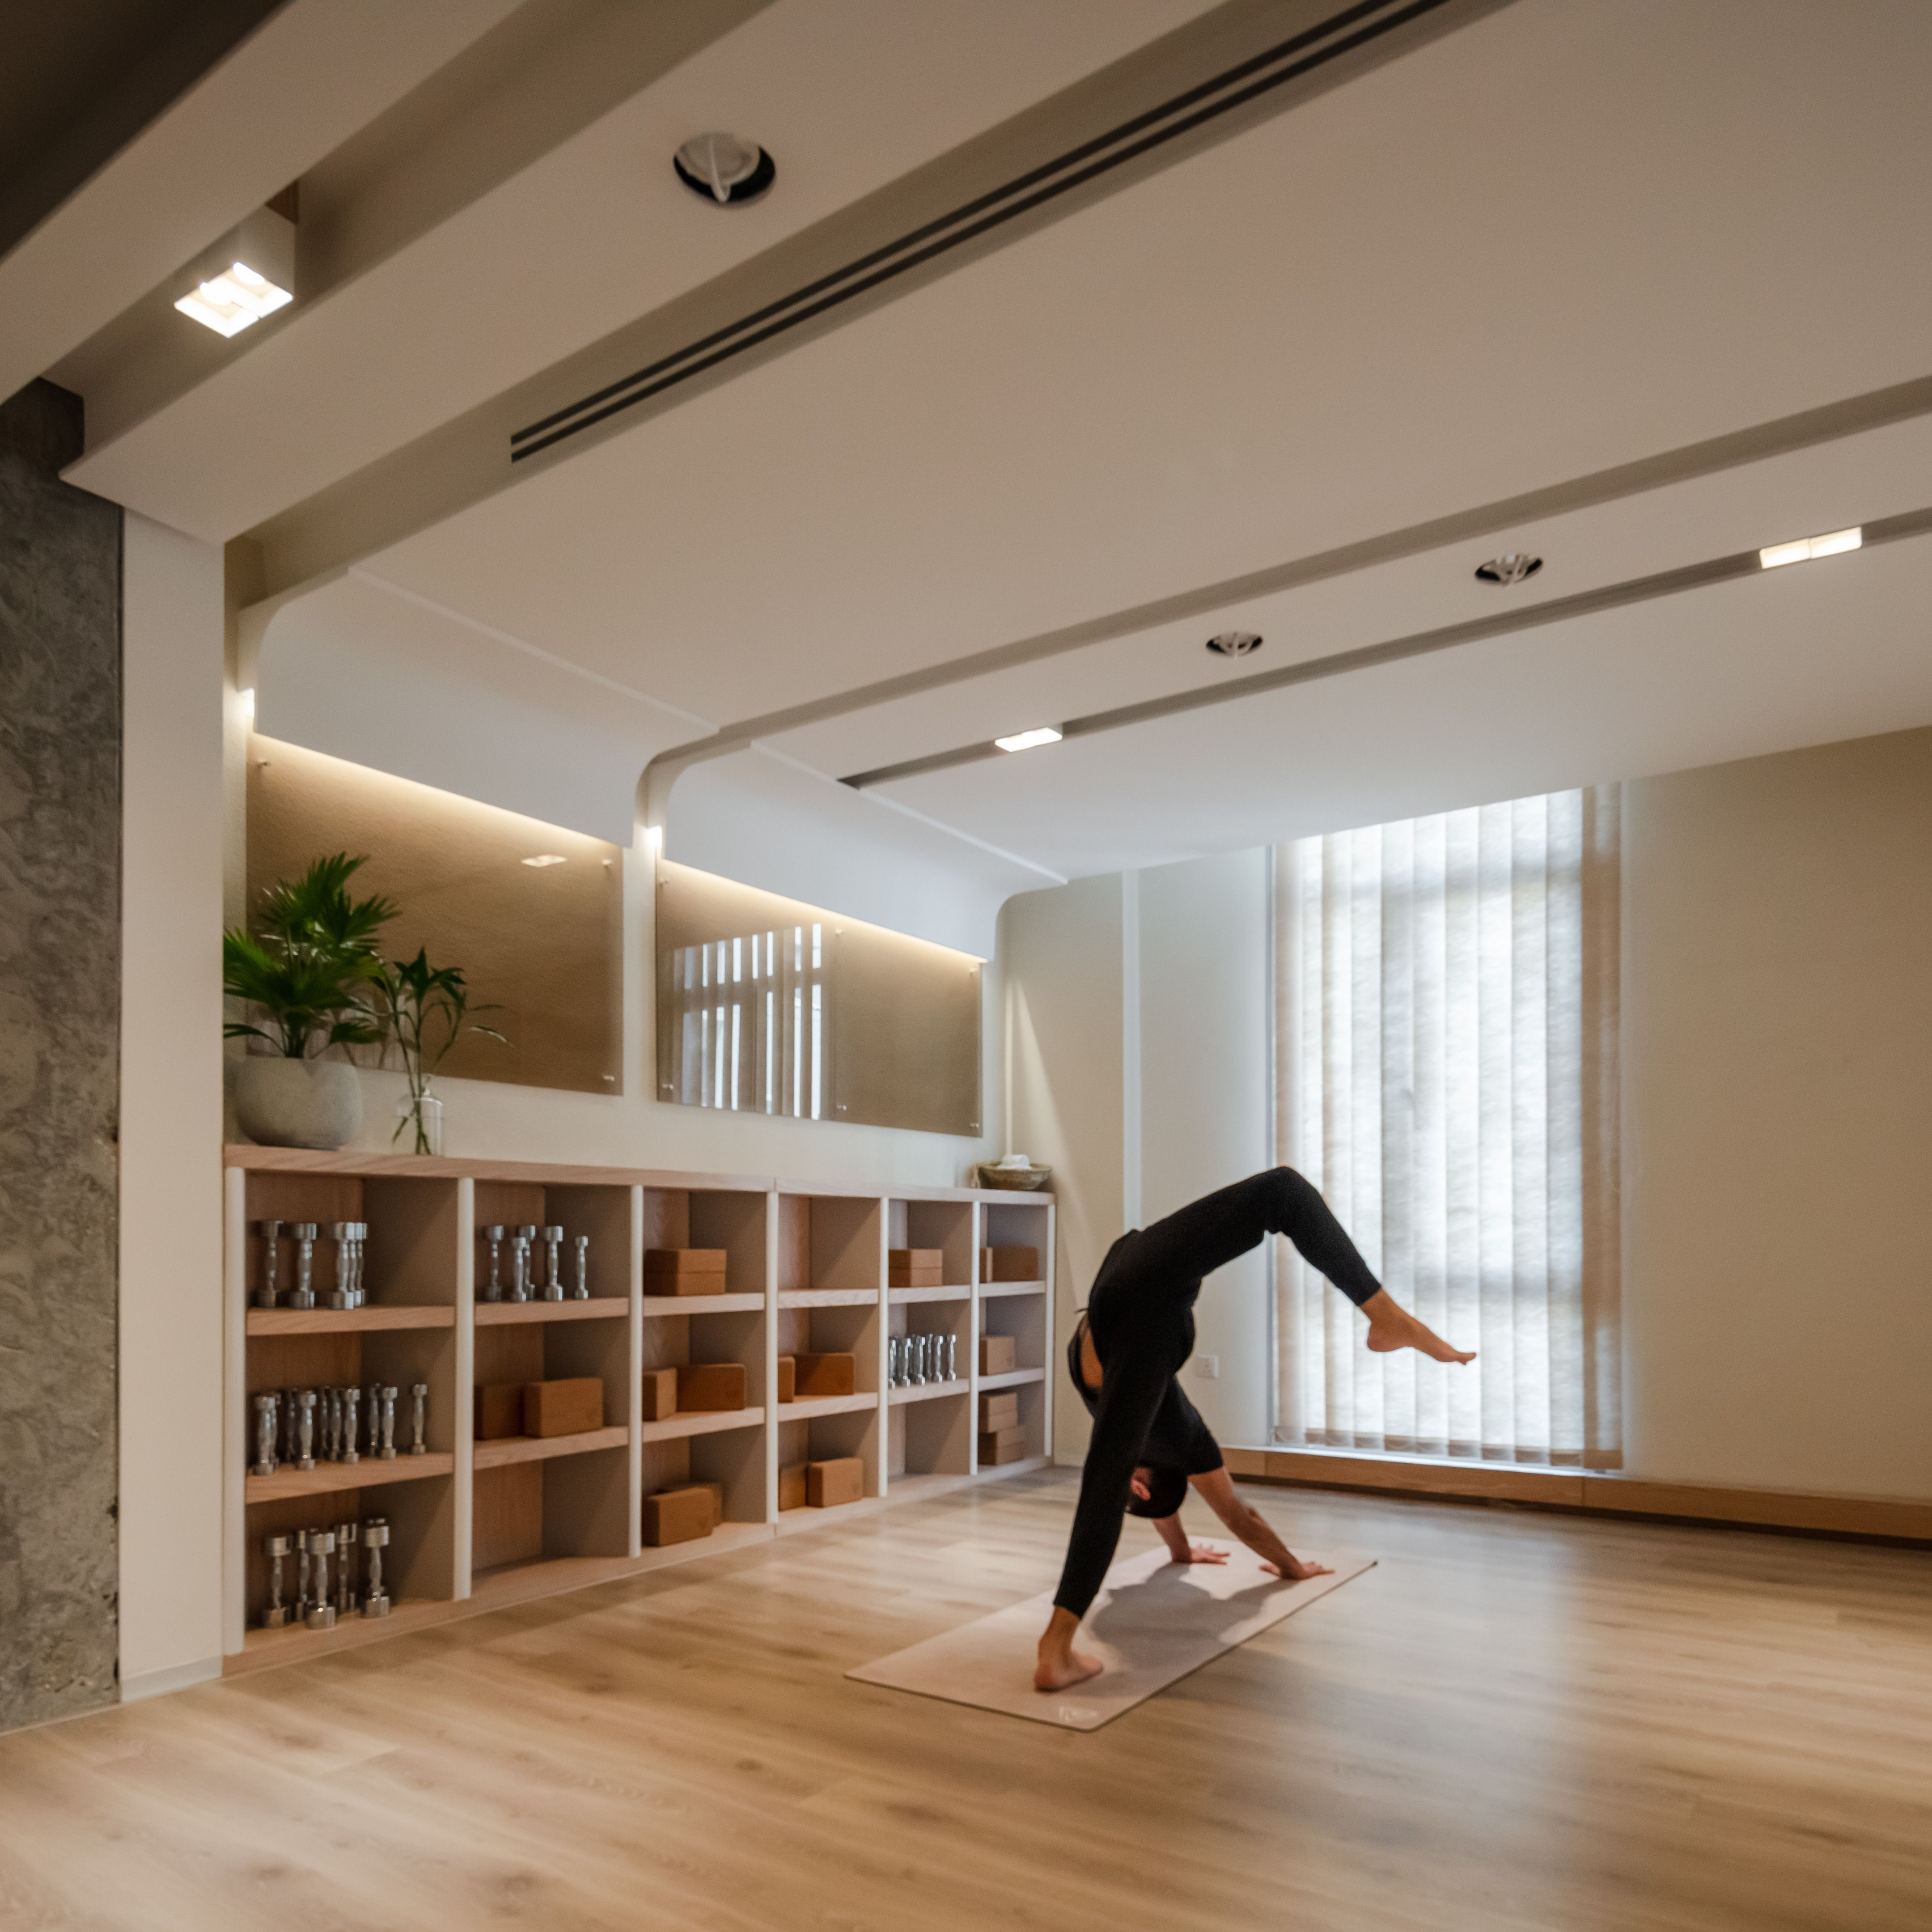 Tru3 Yoga Studio Picture Gallery In 2020 Yoga Studio Design Yoga Studio Home Home Yoga Room